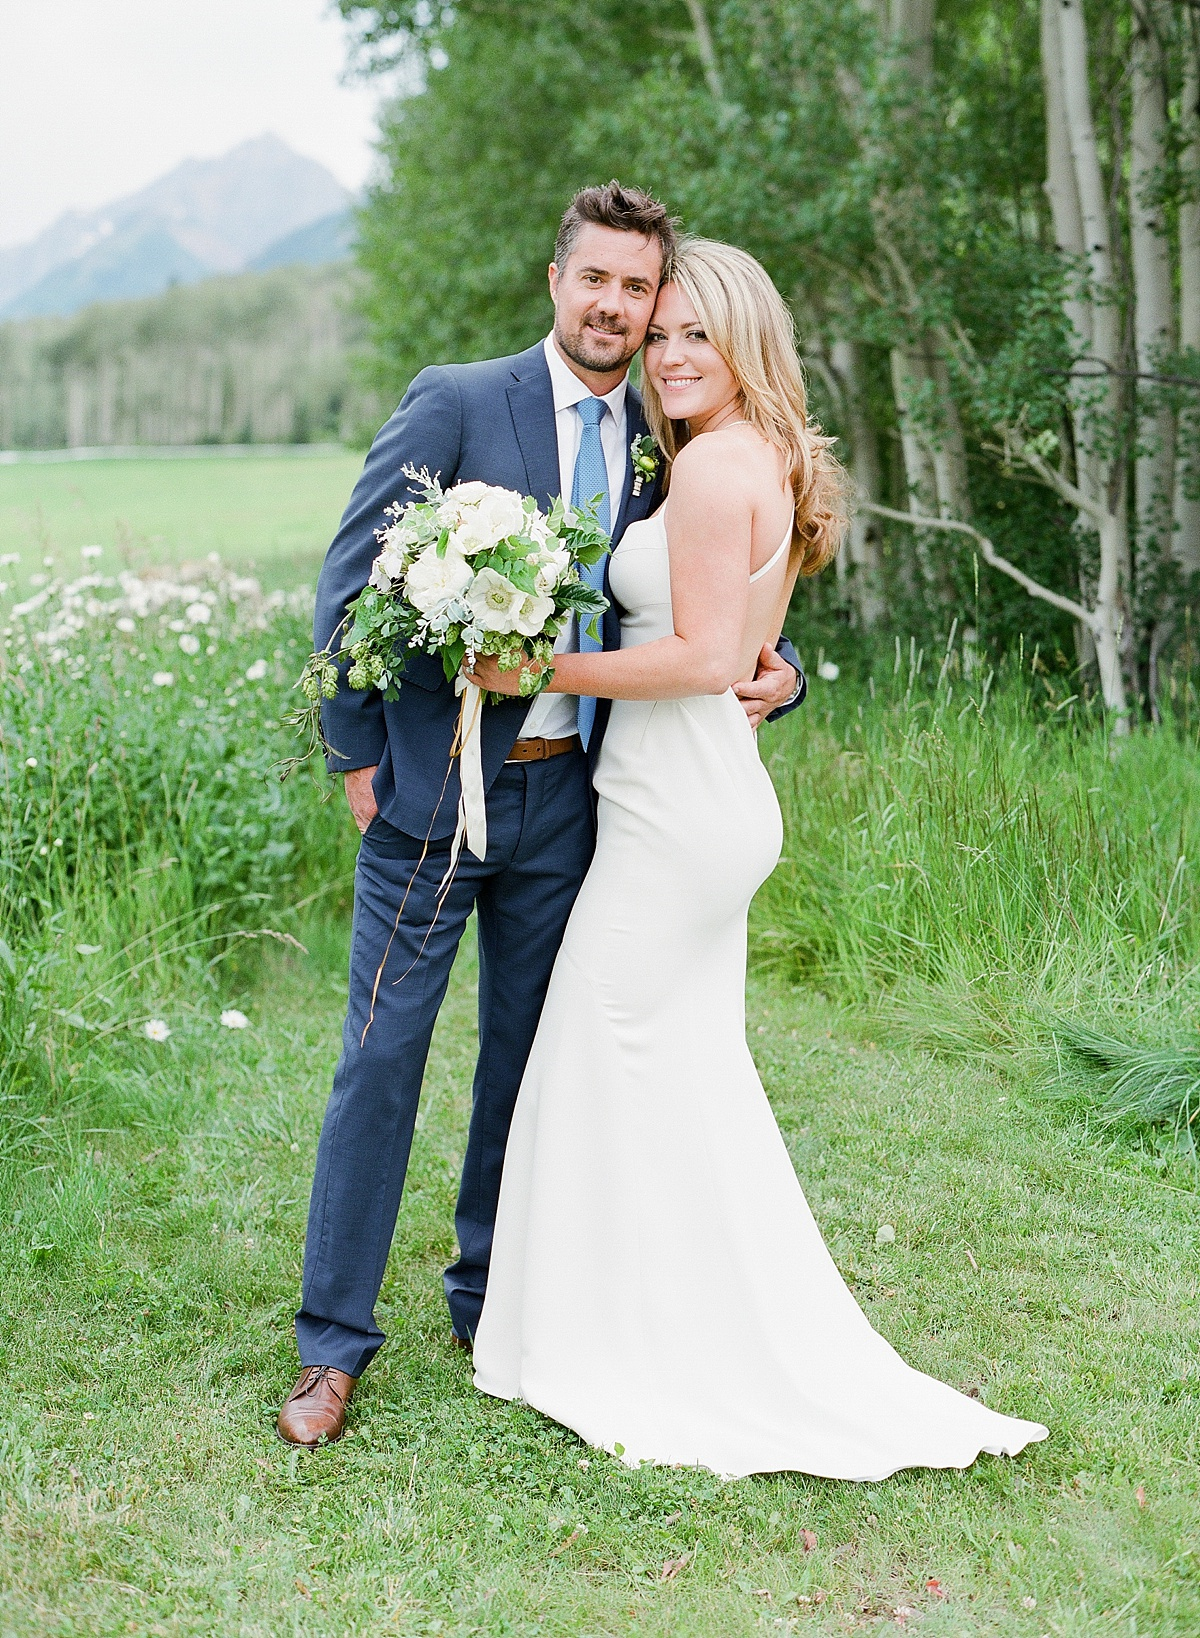 Jose Villa Fine Art Weddings - Fine Art Wedding Photographer